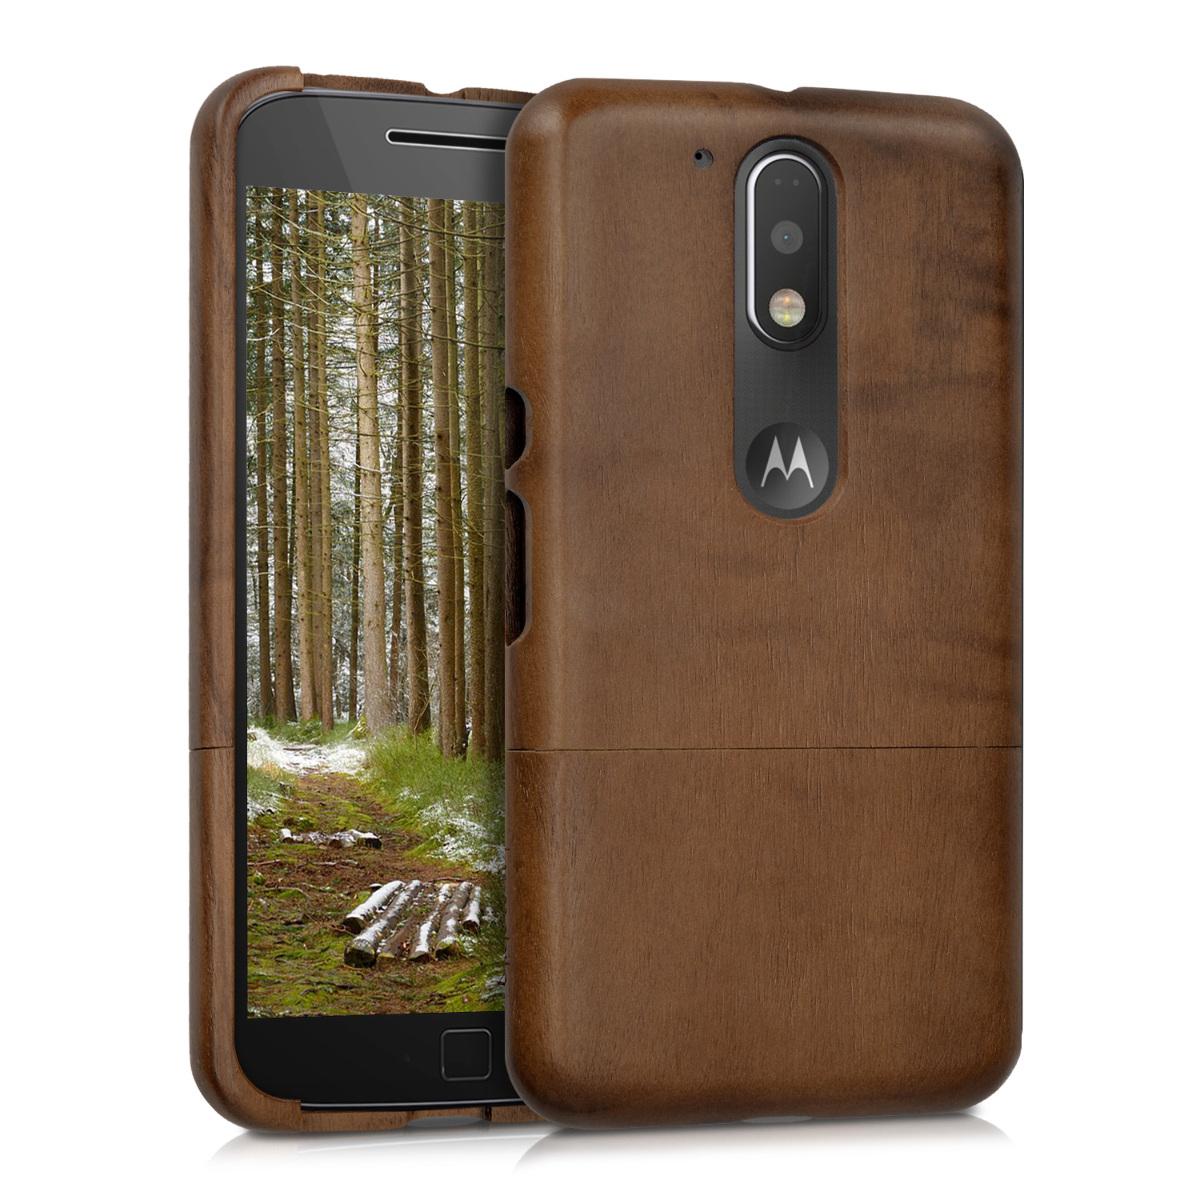 KW Ξύλινη Θήκη Motorola Moto G4 / Moto G4 Plus - (39570.18)